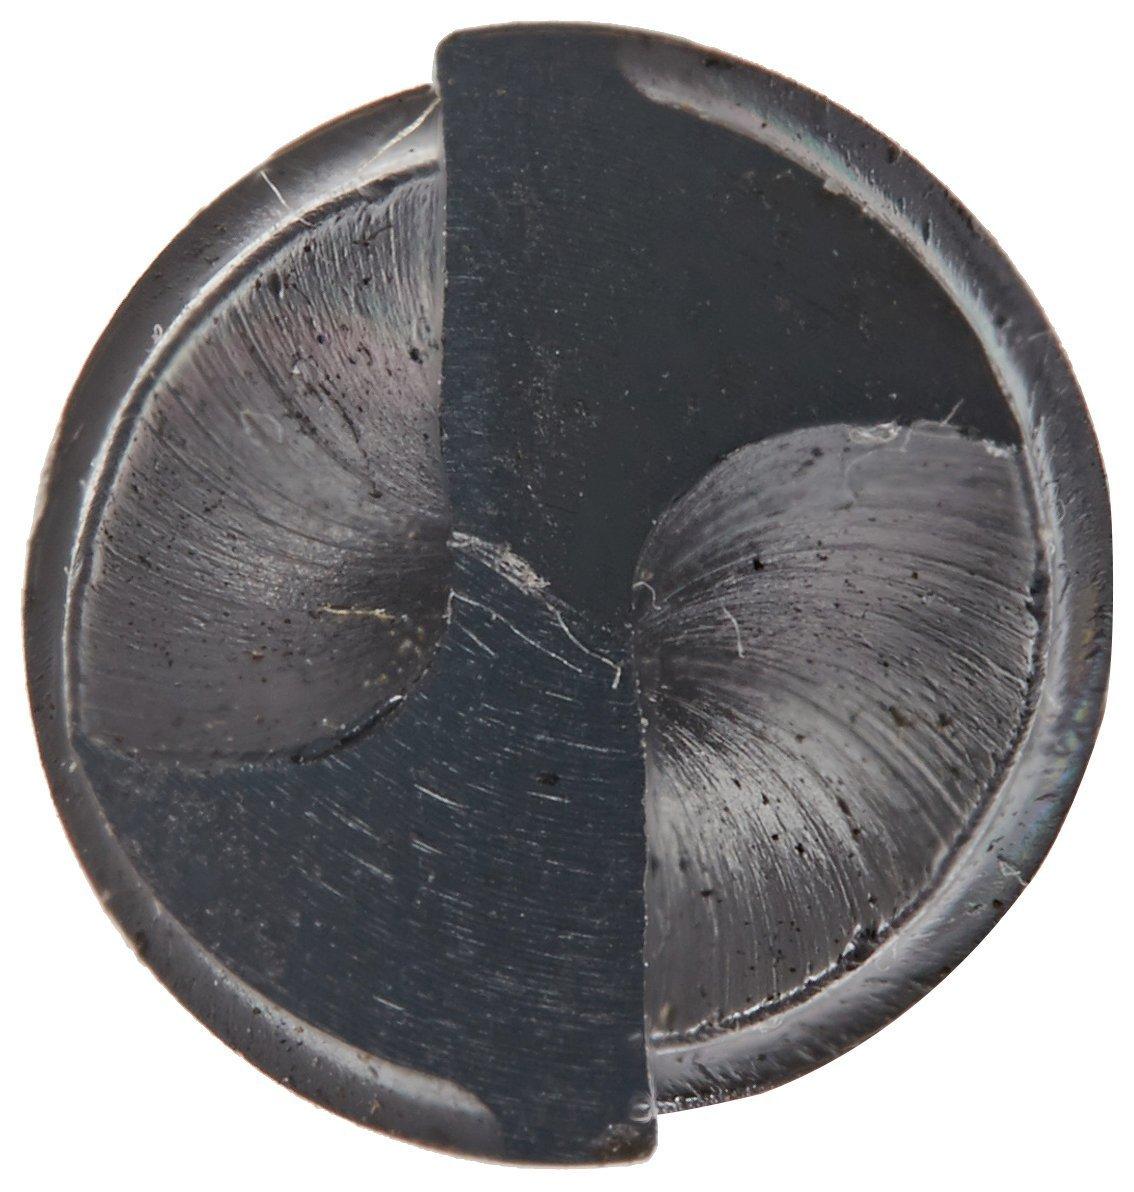 Drill America #53 High Speed Steel Black Oxide Drill Bit DWDN Series Pack of 12